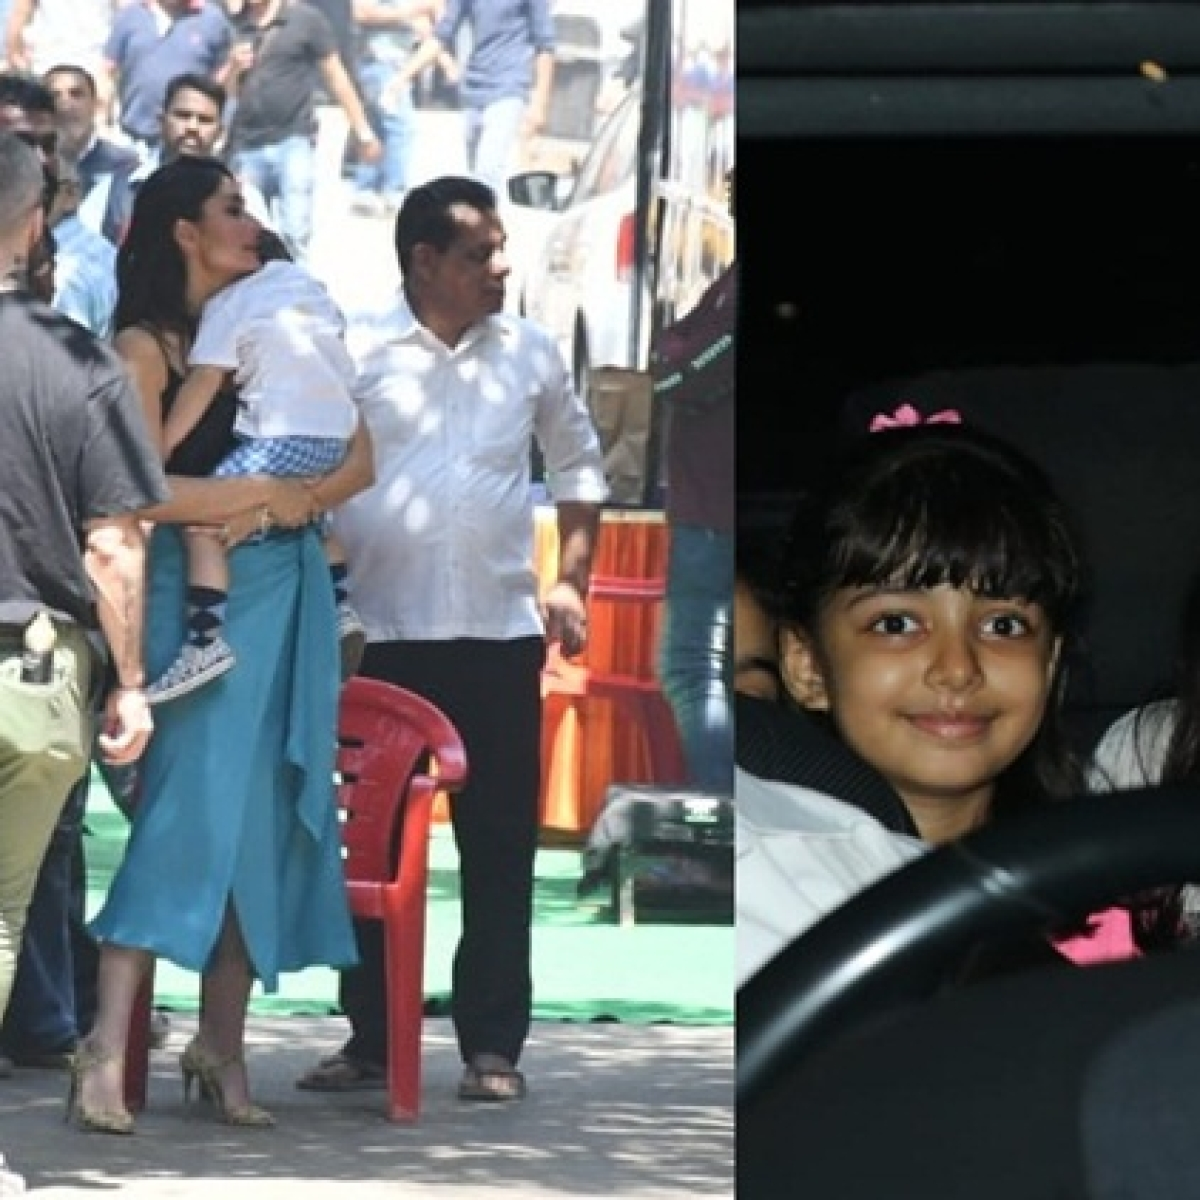 In Pics: Kareena Kapoor - Taimur Ali Khan, Aishwarya Rai - Aaradhya Bachchan spotted in town